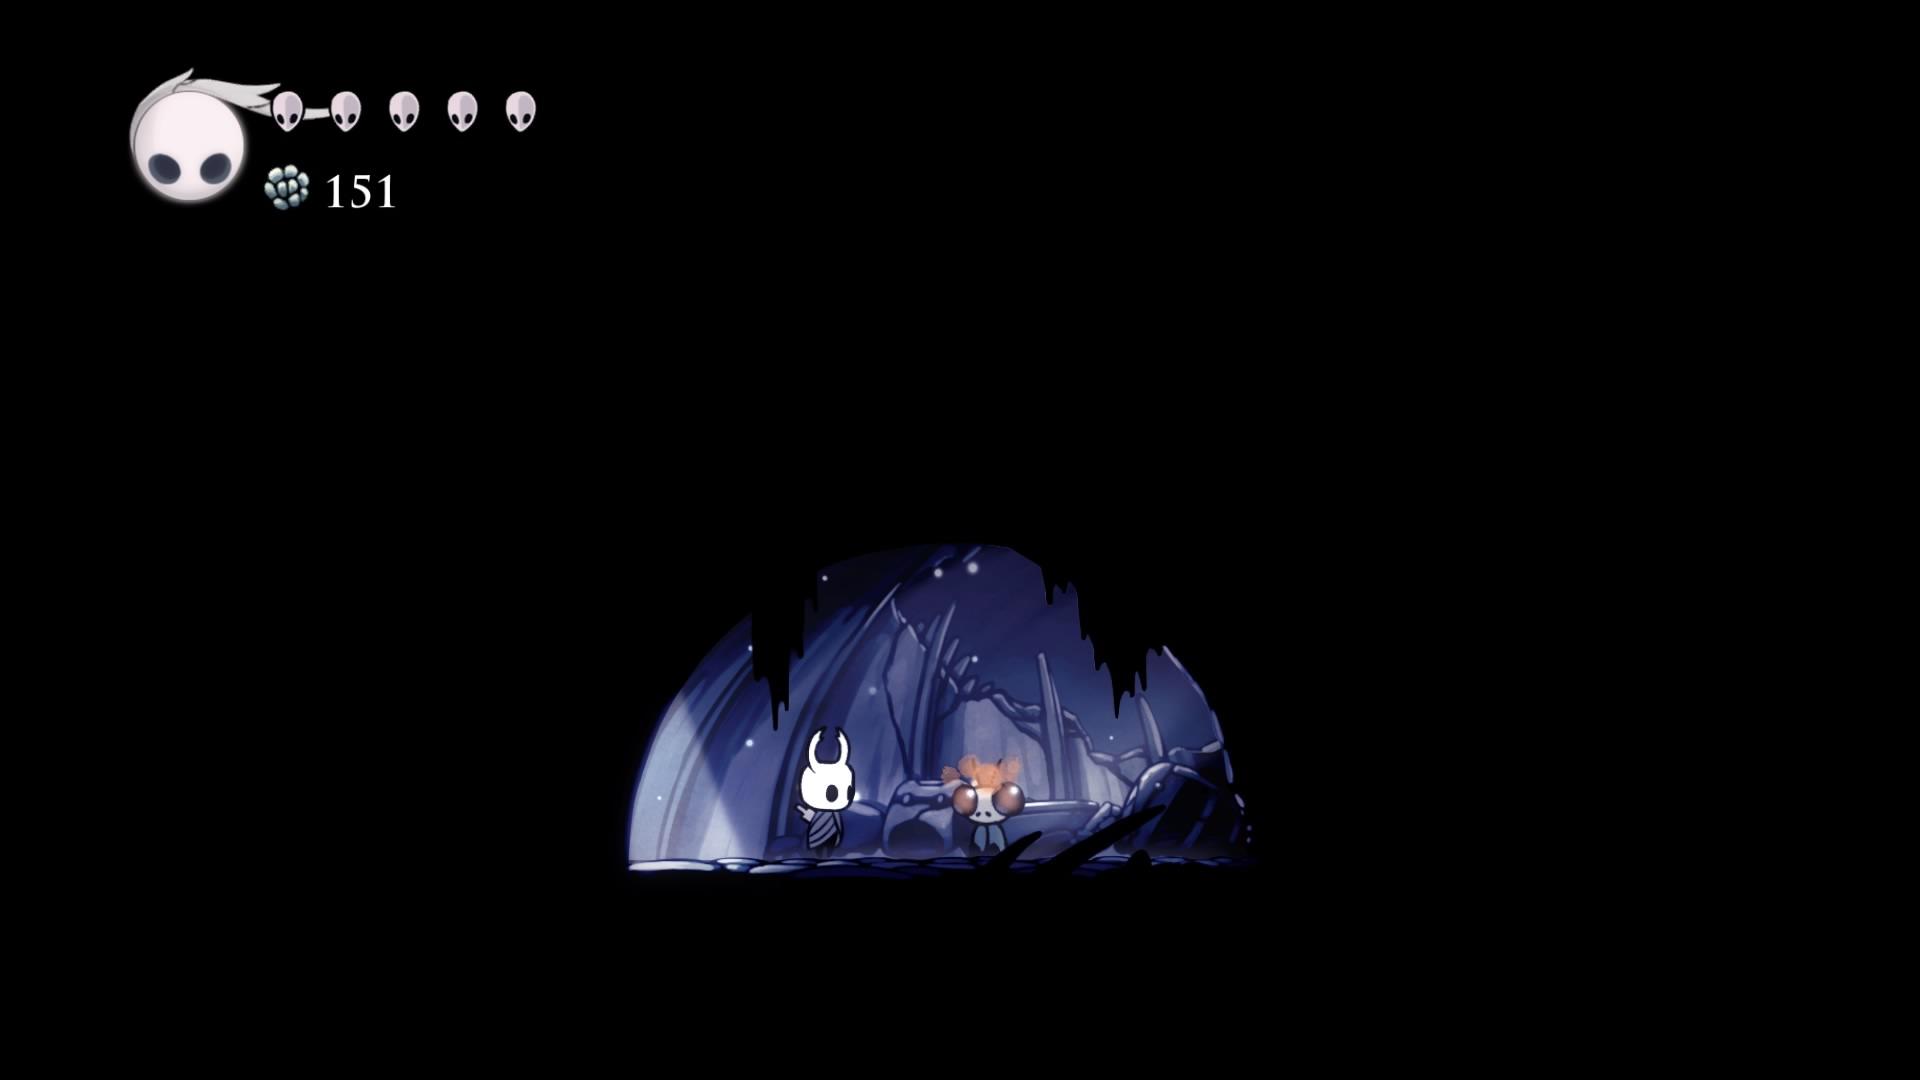 Hollow Knight 20190809202309 - Hollow Knight, guida e lore: Sentieri Dimenticati II